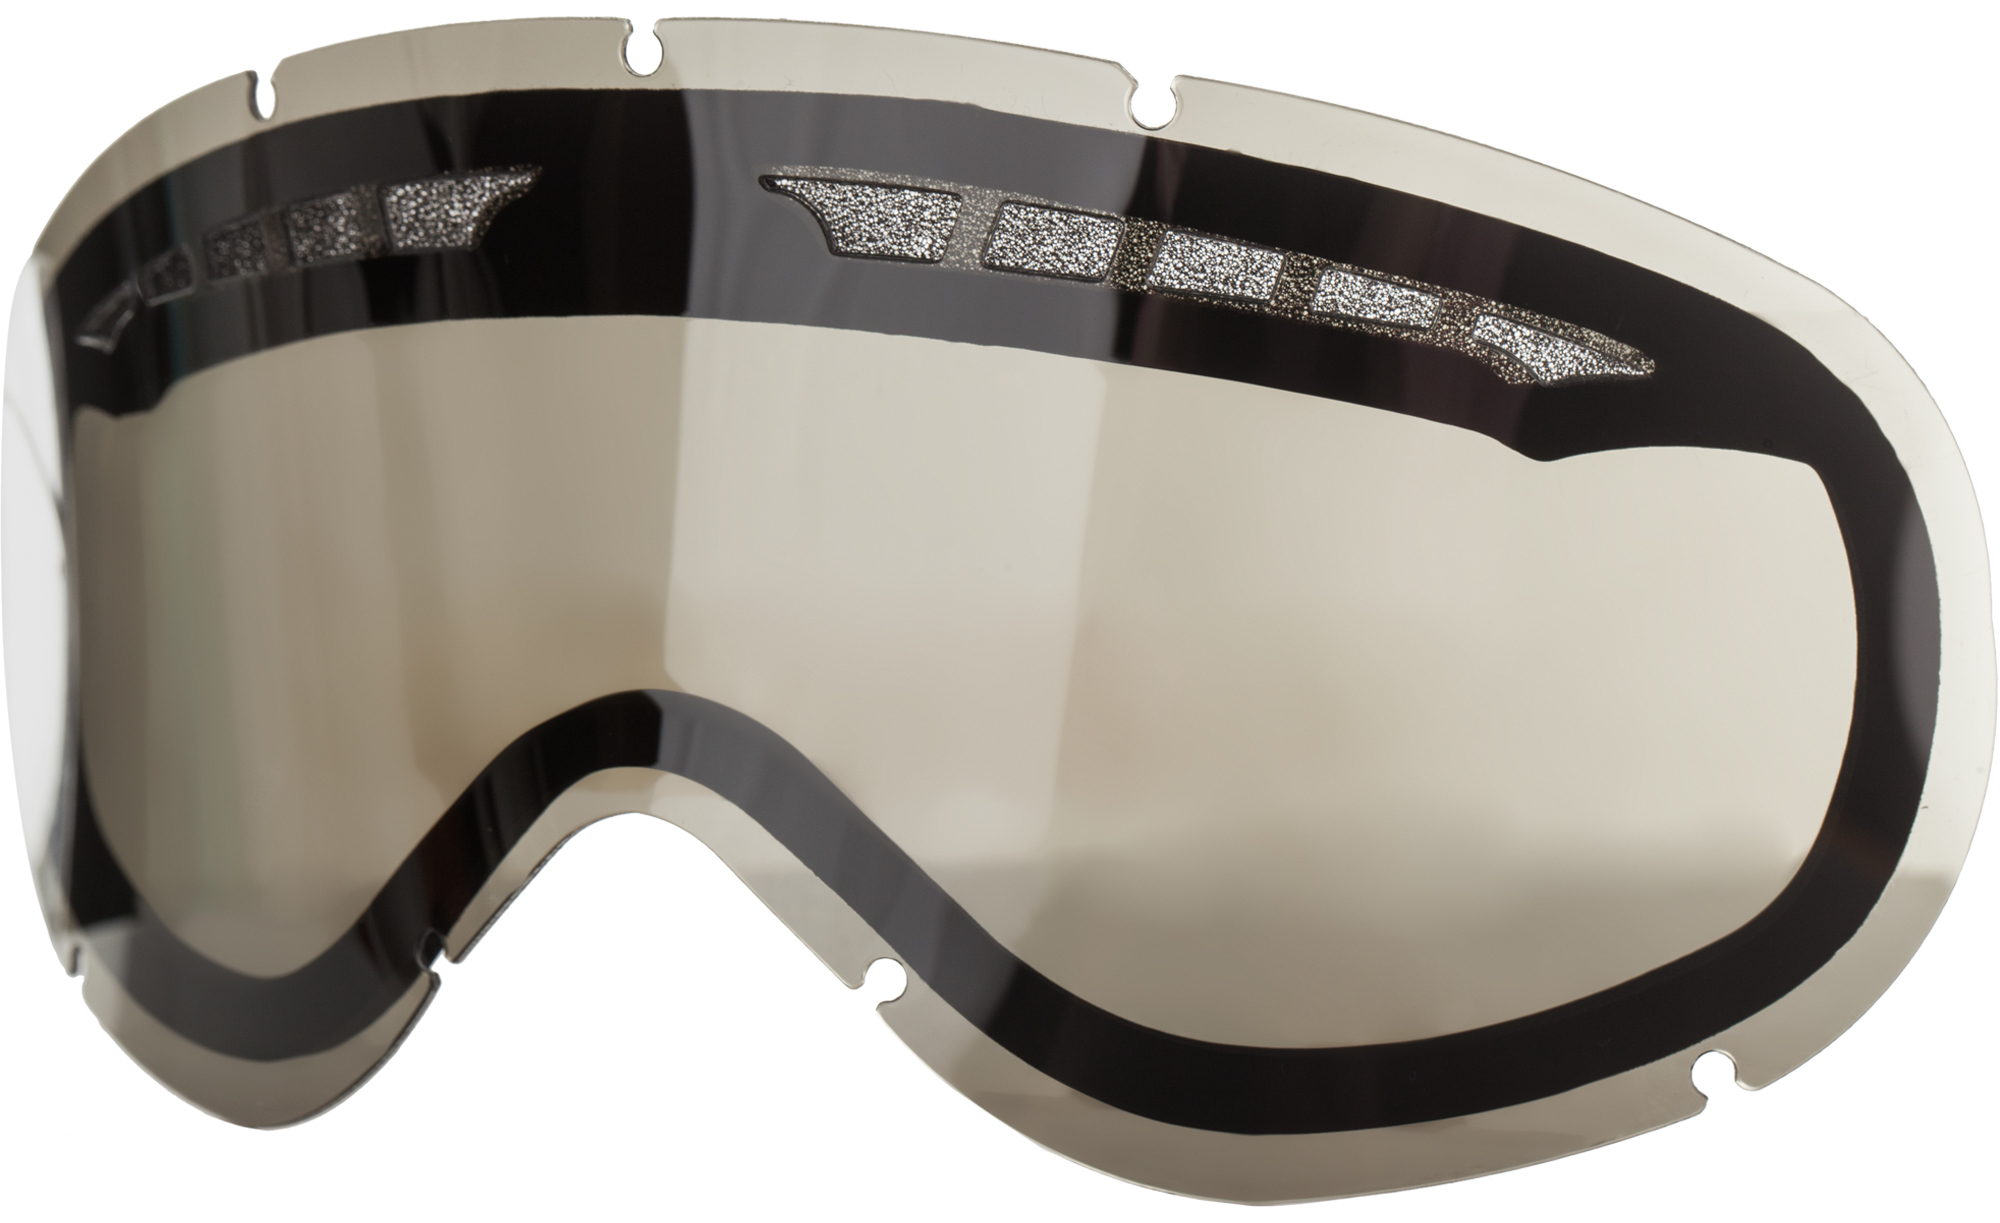 Dragon Линза для маски Dragon DX RPL LENS - Dark Smoke линза для маски мото вело oakley half jacket xlj repl lens kit black iridium